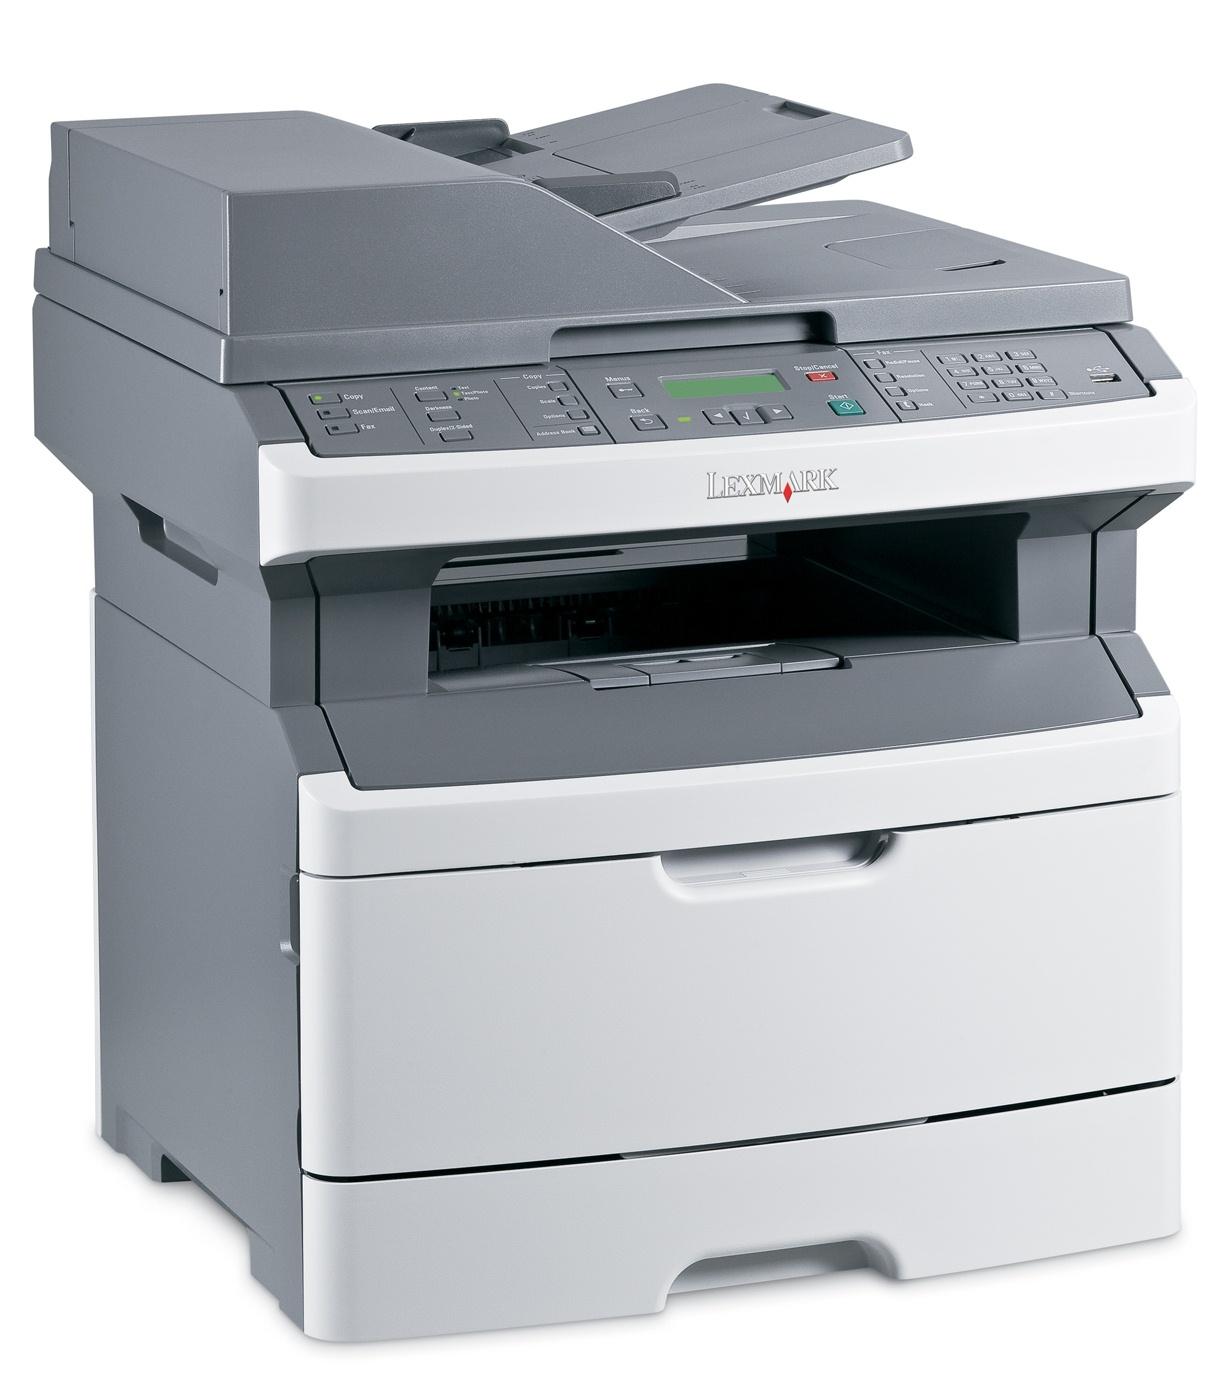 '900 Firmware Error' Displays on a Lexmark T65x Printer ...